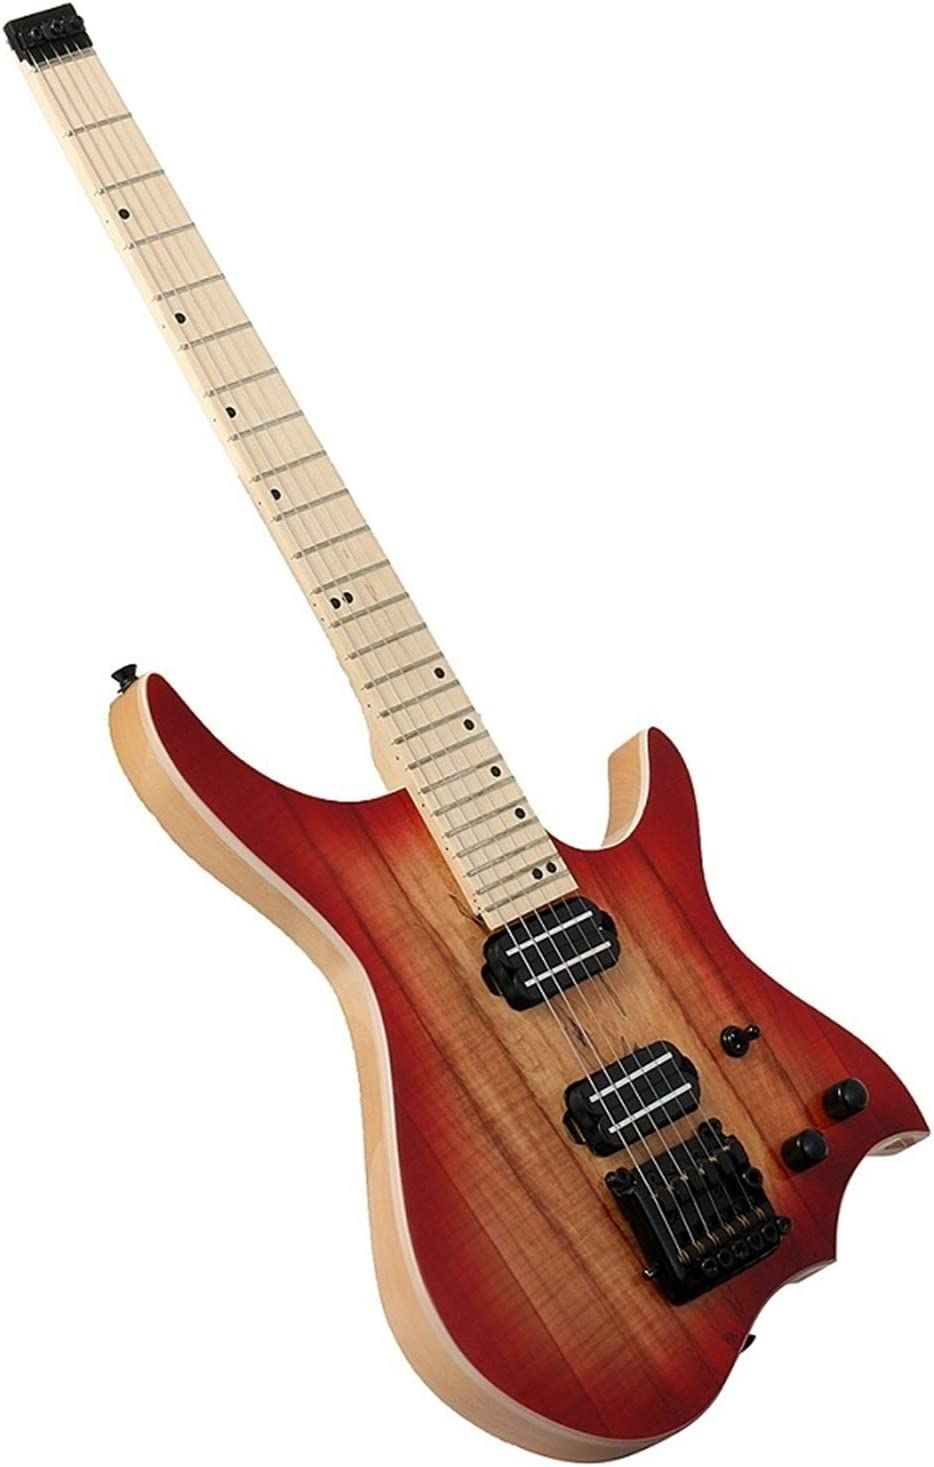 SUNXK Sin Cabeza Ash WoodBody Guitarra eléctrica Flame Maple Neck Red Spalted Top de Arce